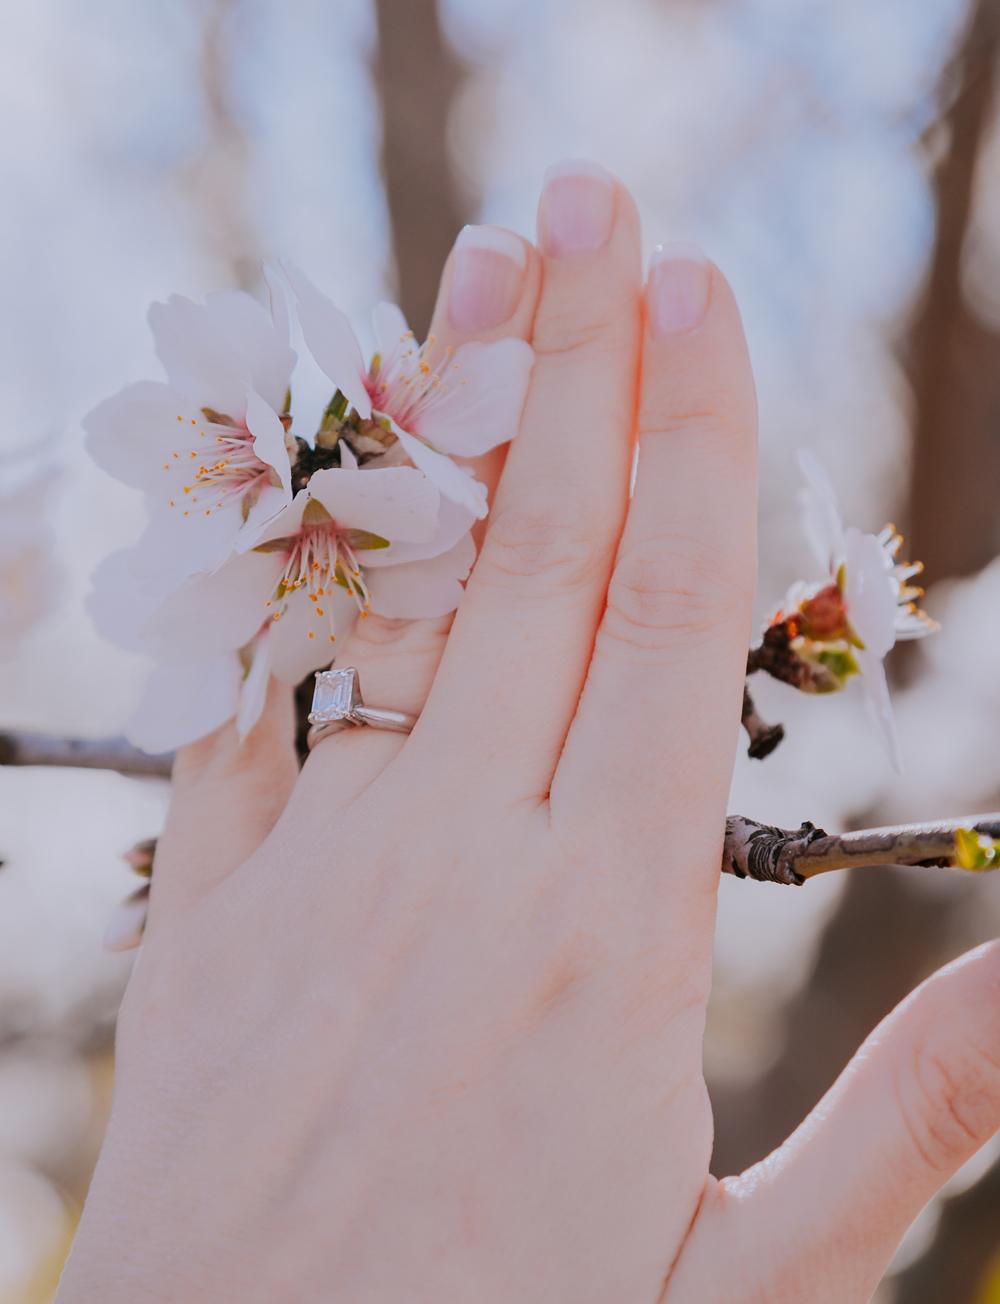 Engagement-photoshoot-chico-sacramento-blooming-orchard9-2.jpg